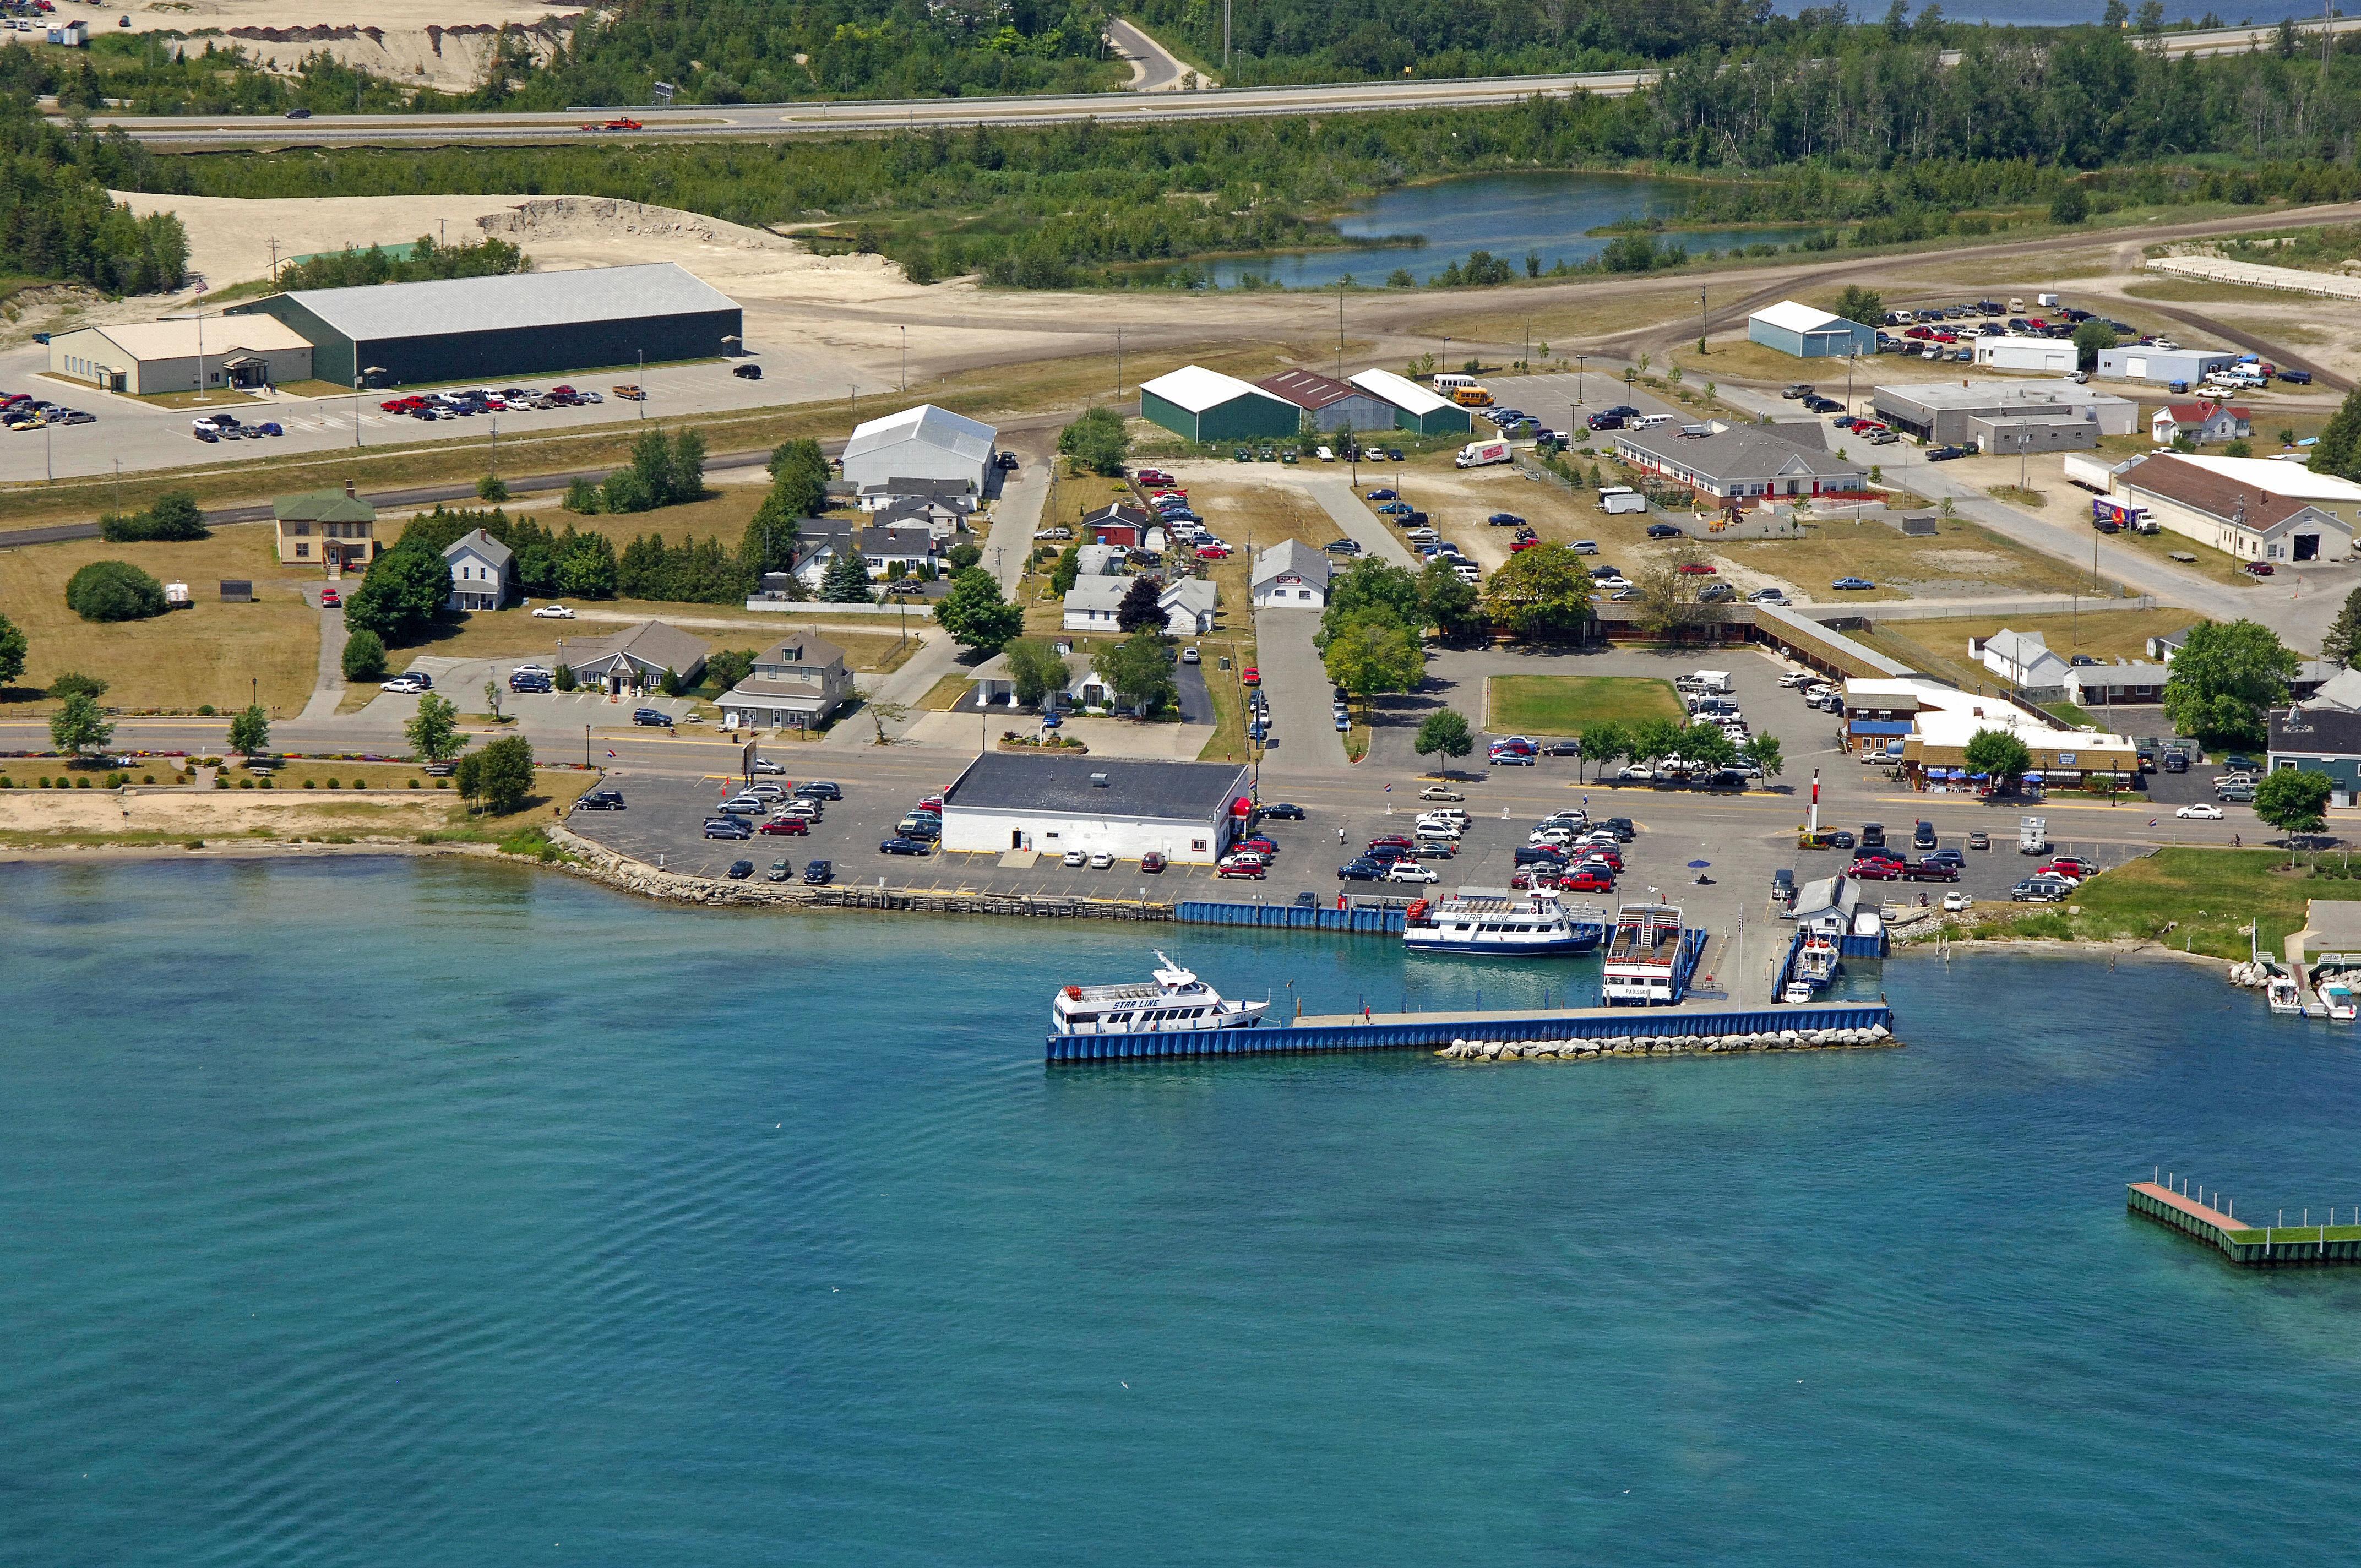 Chicago Ferry To Mackinac Island